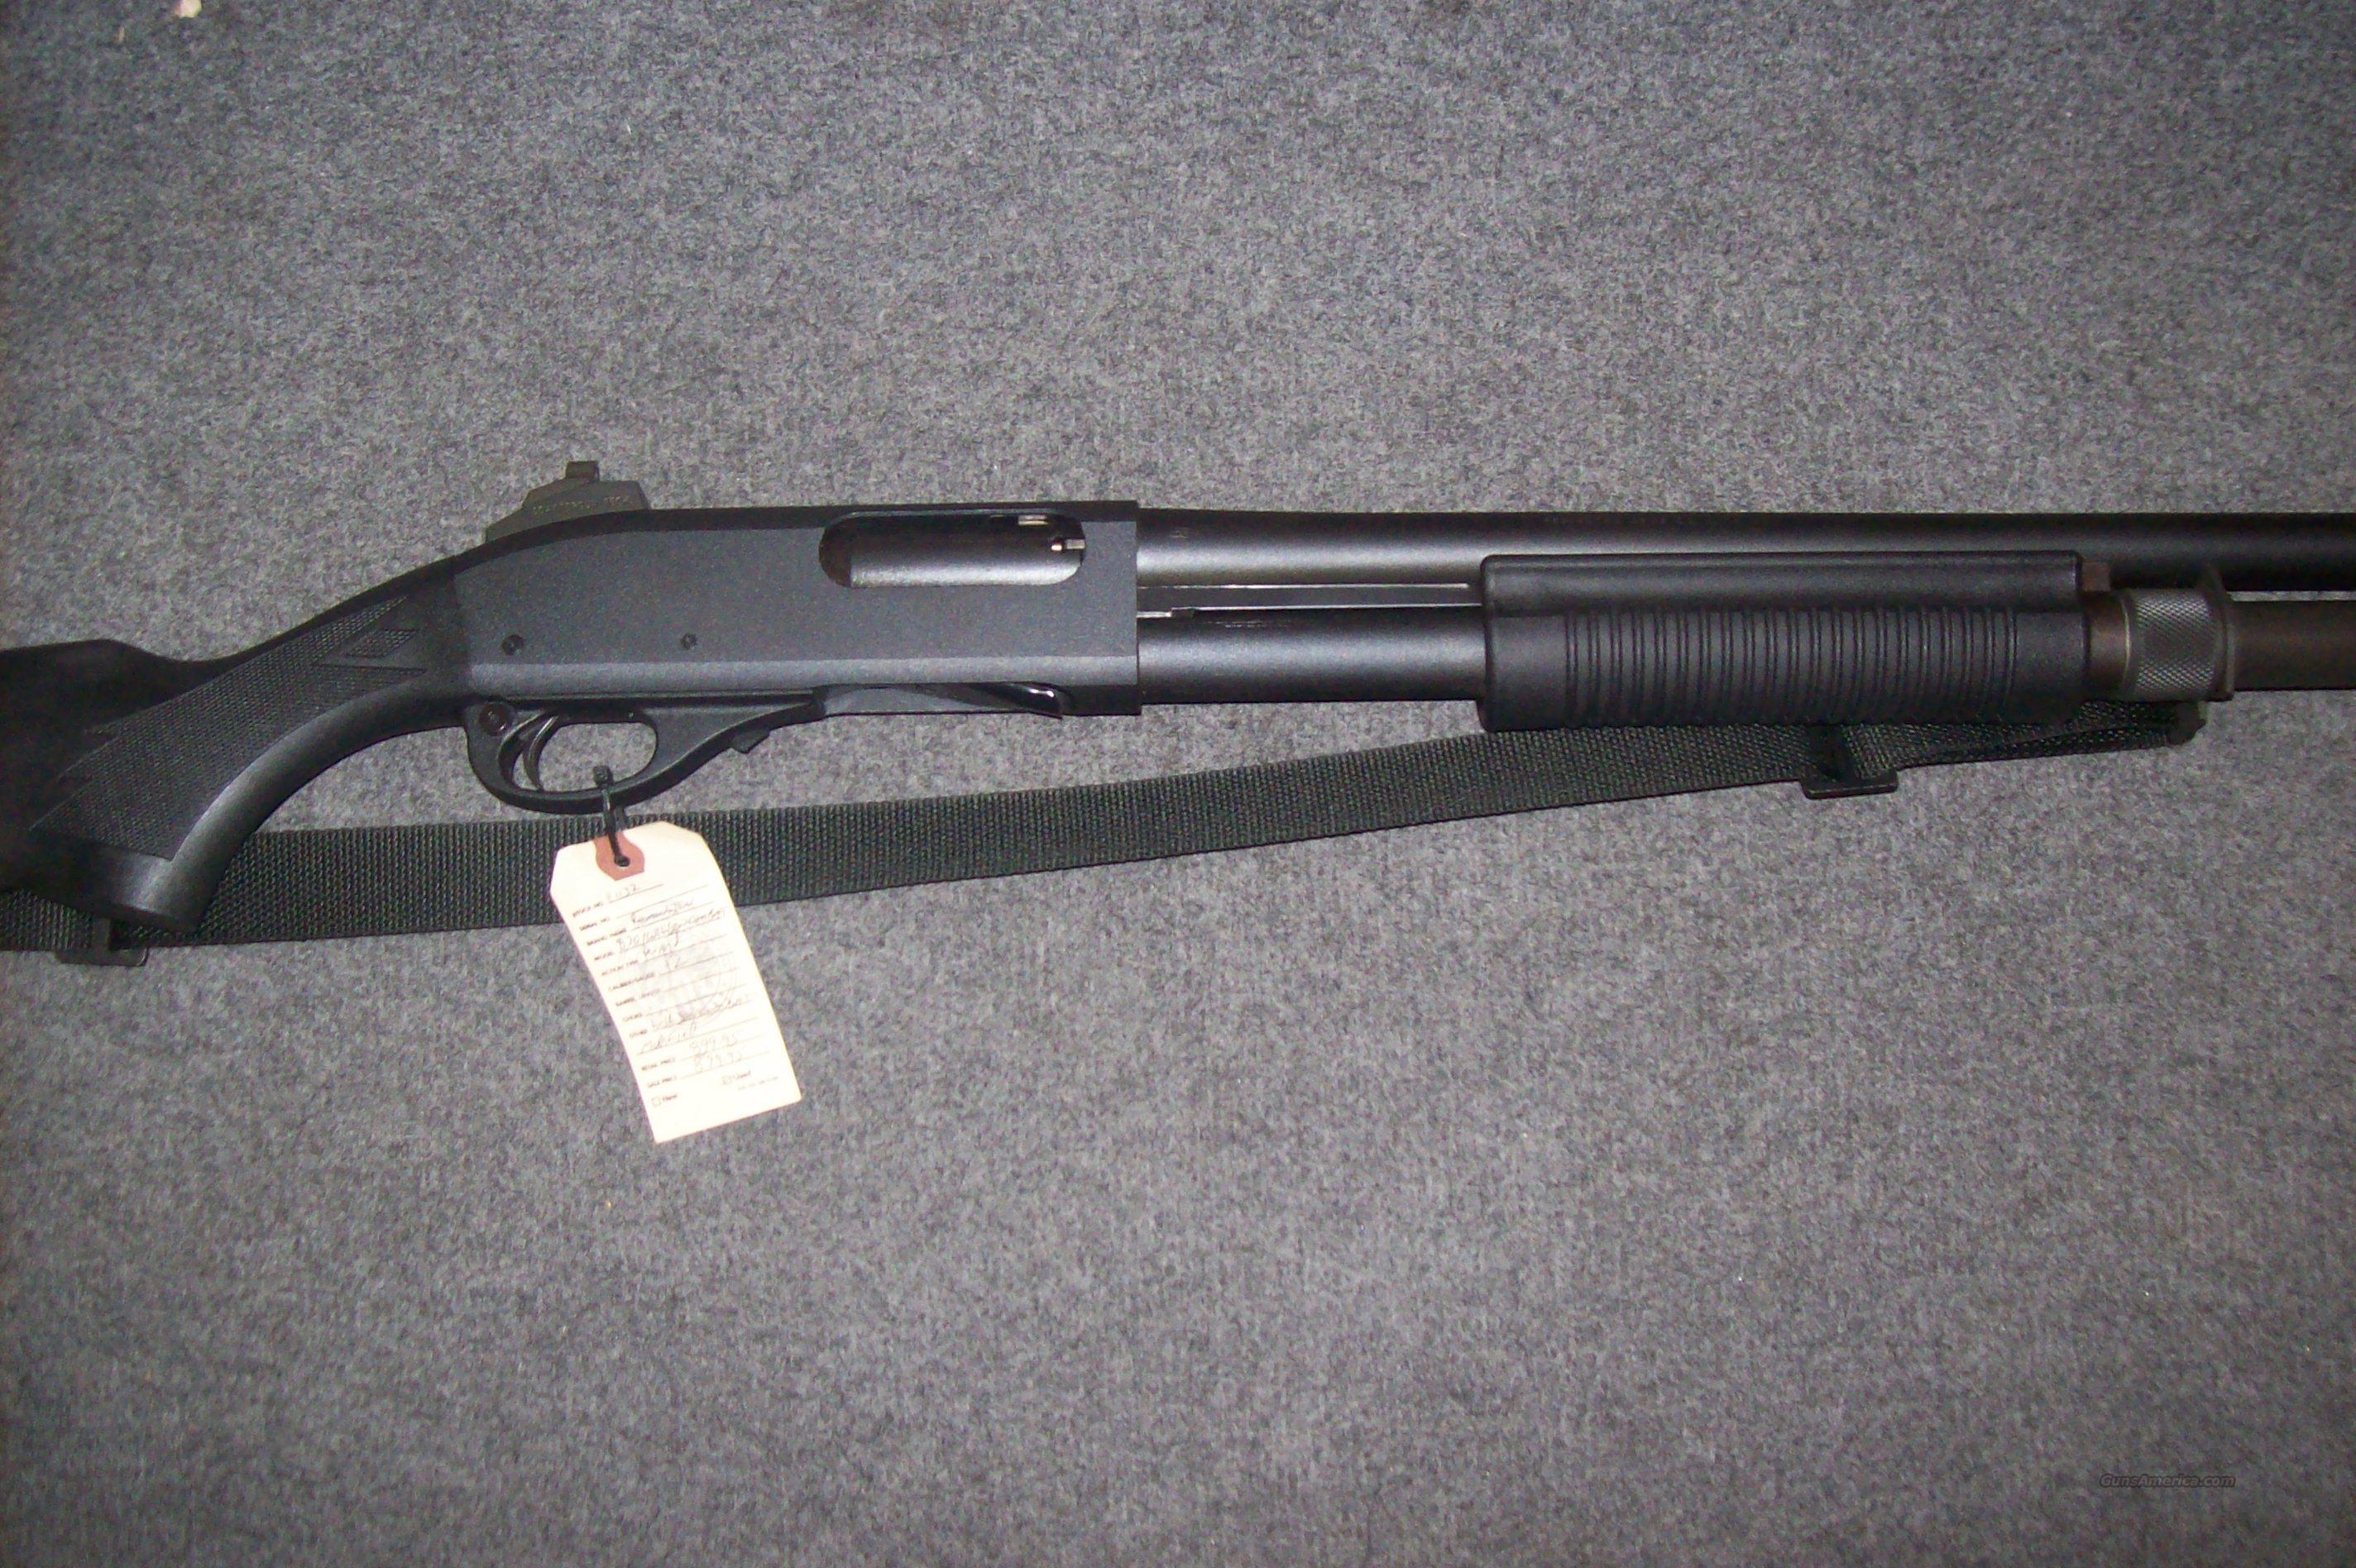 Remington 870 / Wilson Combat 12 Gauge Pump Shotgun